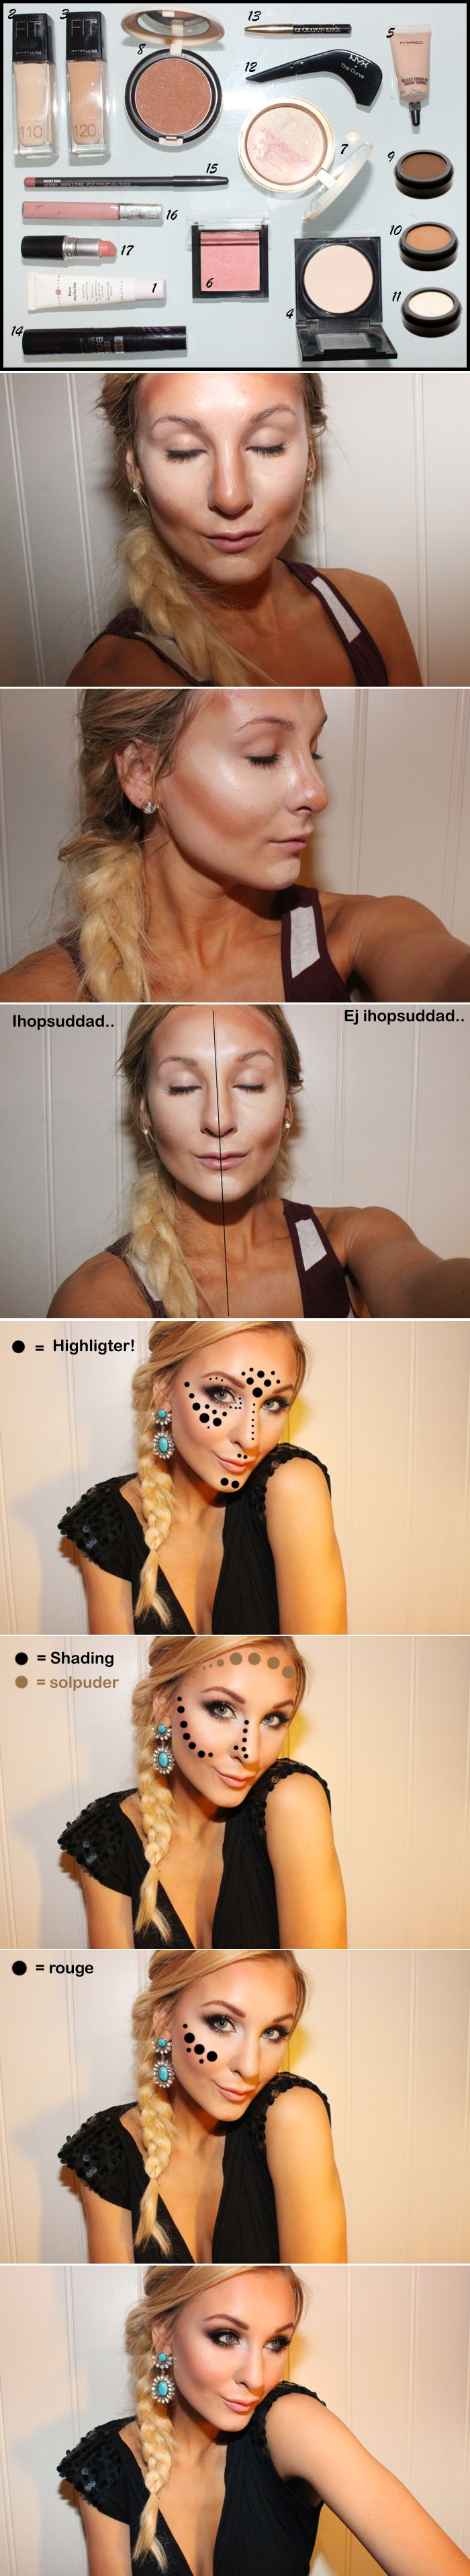 Get the look - Kim Kardashian face tutorial